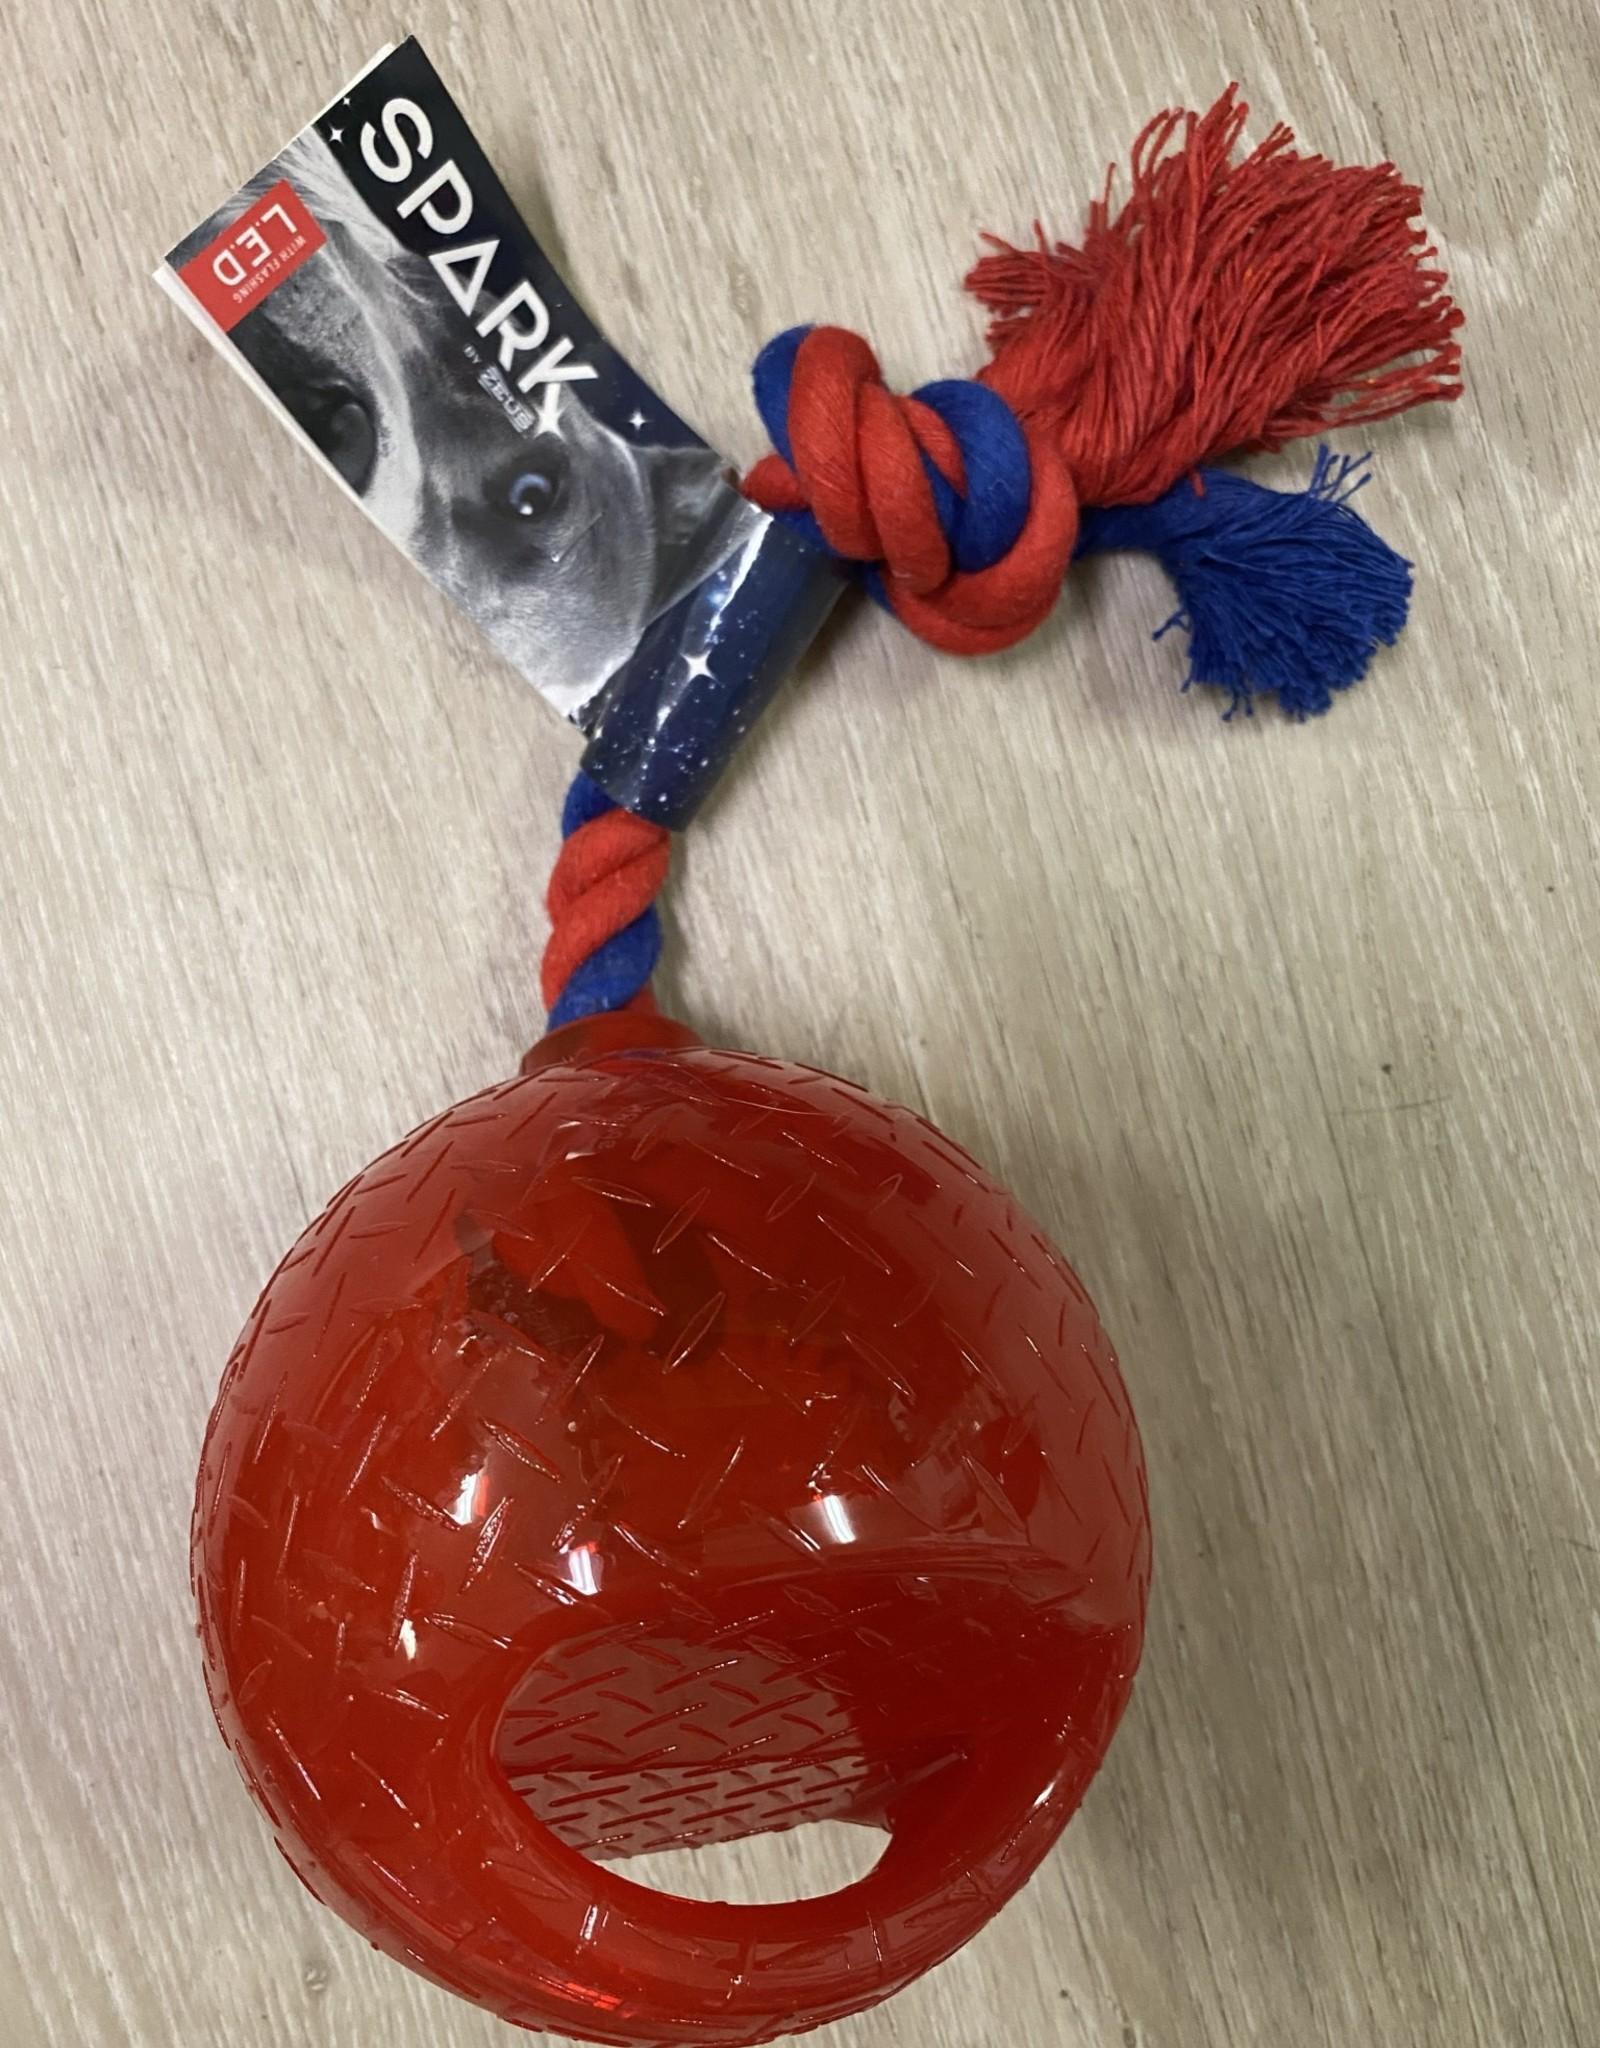 Zeus Spark Tug Ball- Small Red